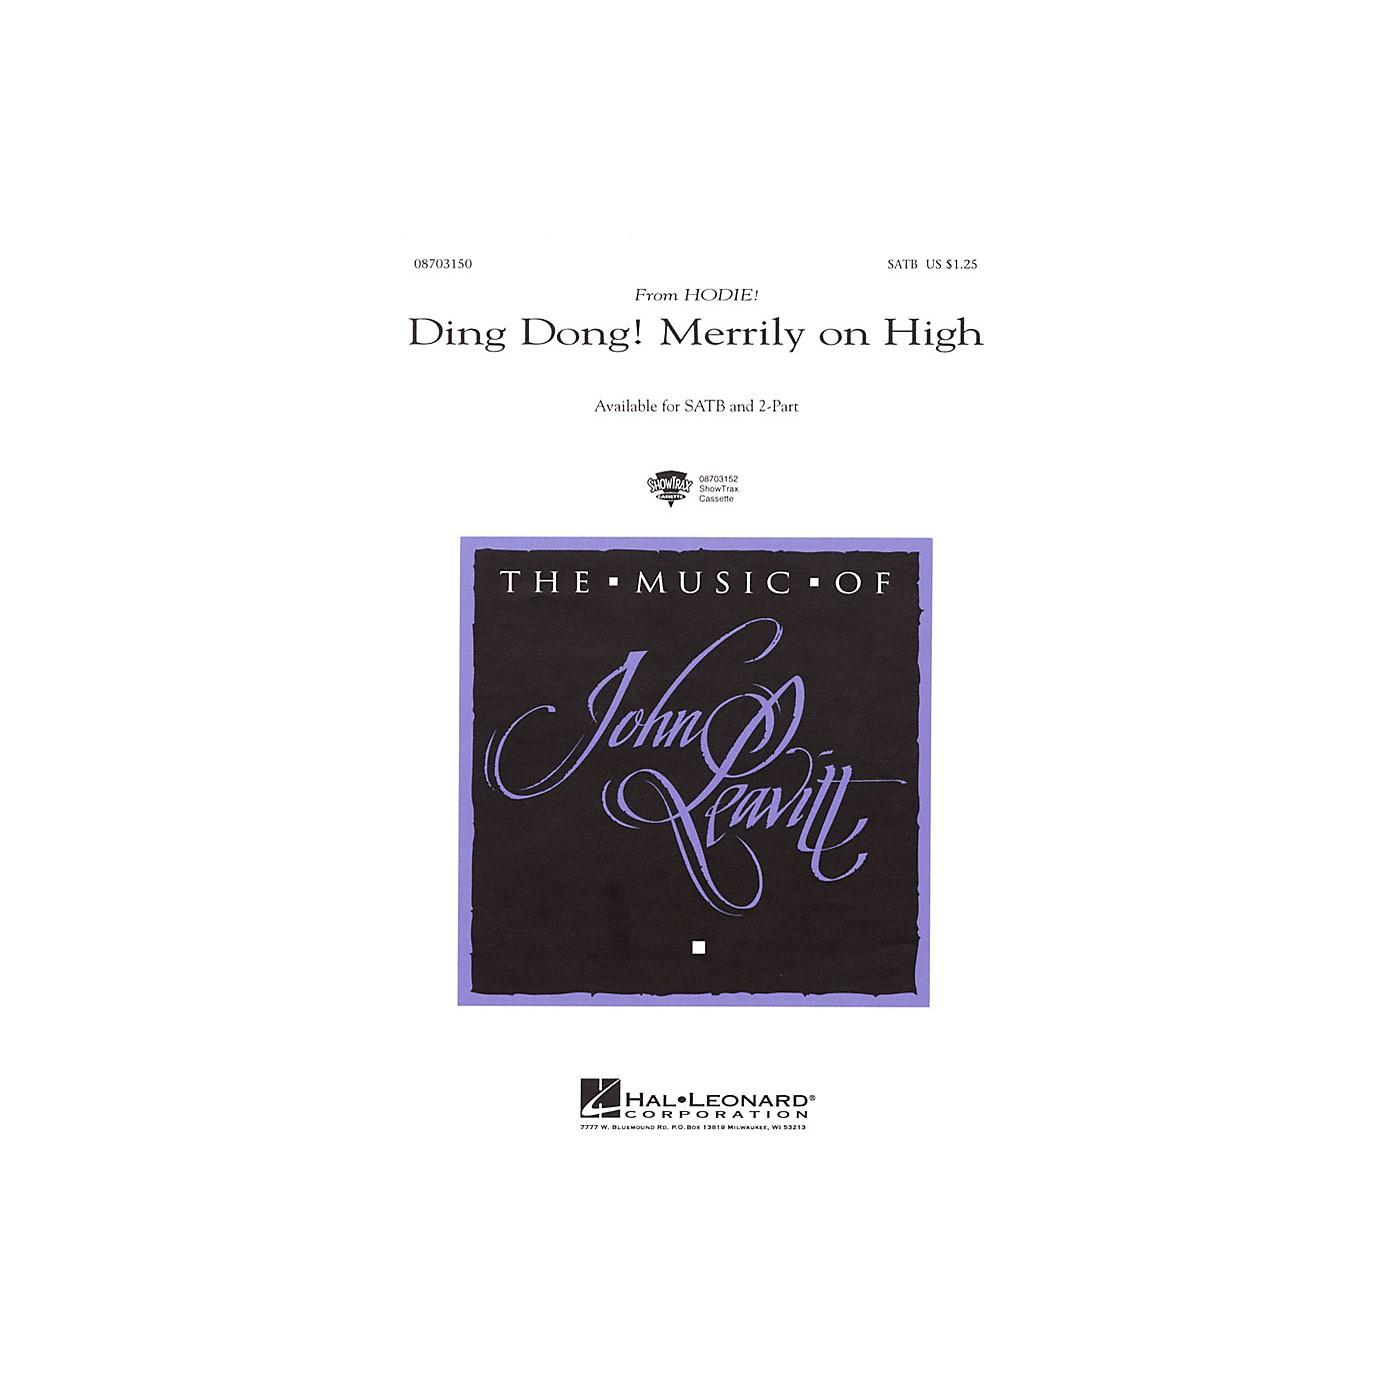 Hal Leonard Ding Dong! Merrily on High SATB arranged by John Leavitt thumbnail